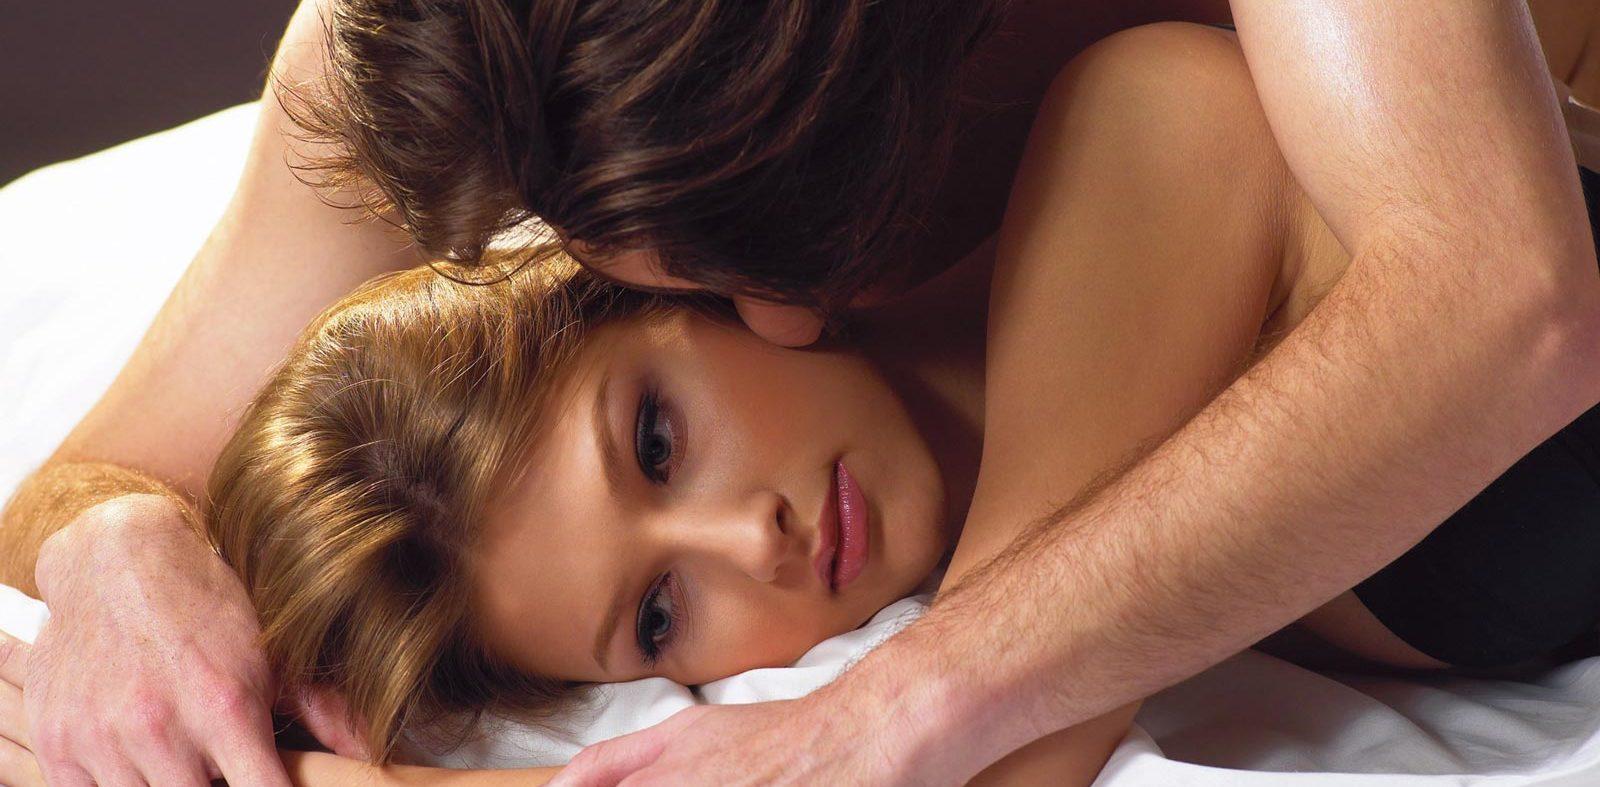 Трибестан - фригидность, аноргазмия и лечение аноргазмии